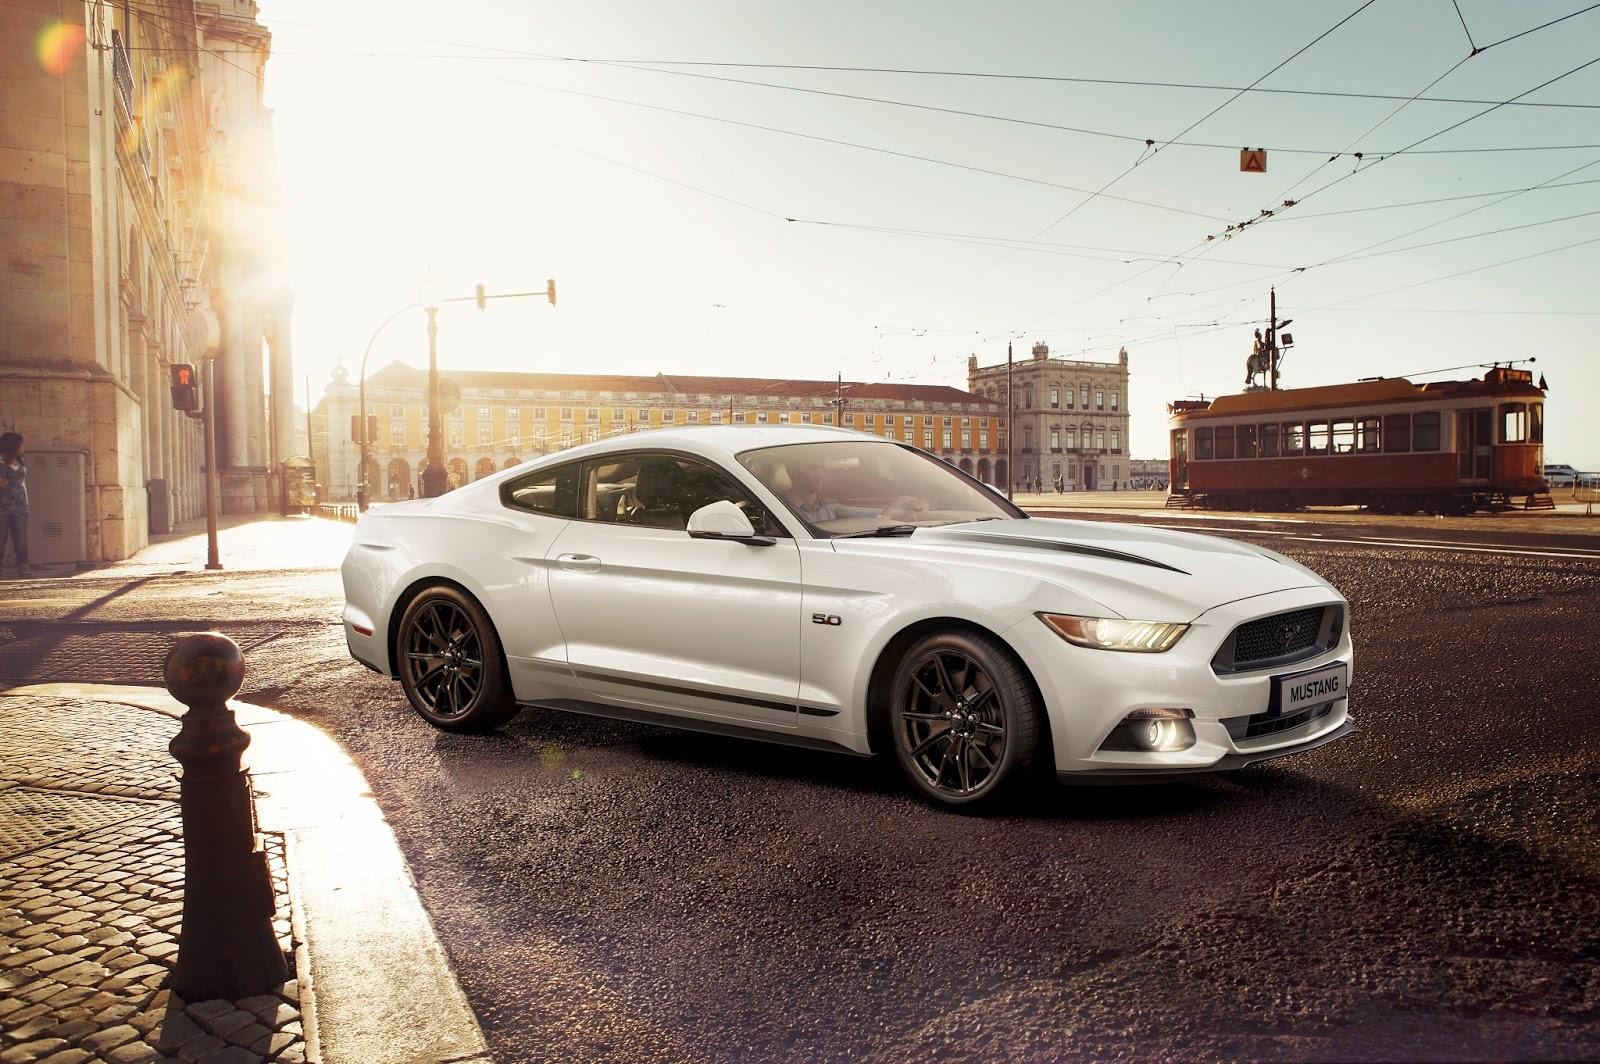 FordGoFurther2016 Mustang 012B252812529 Ο... τυφώνας Ford Mustang εξαπλώνεται σε όλο τον κόσμο και ξεπουλάει! Bestseller, cabrio, Ford Mustang, Muscle cars, Sales, πωλήσεις, πωλήσεις αυτοκινήτων